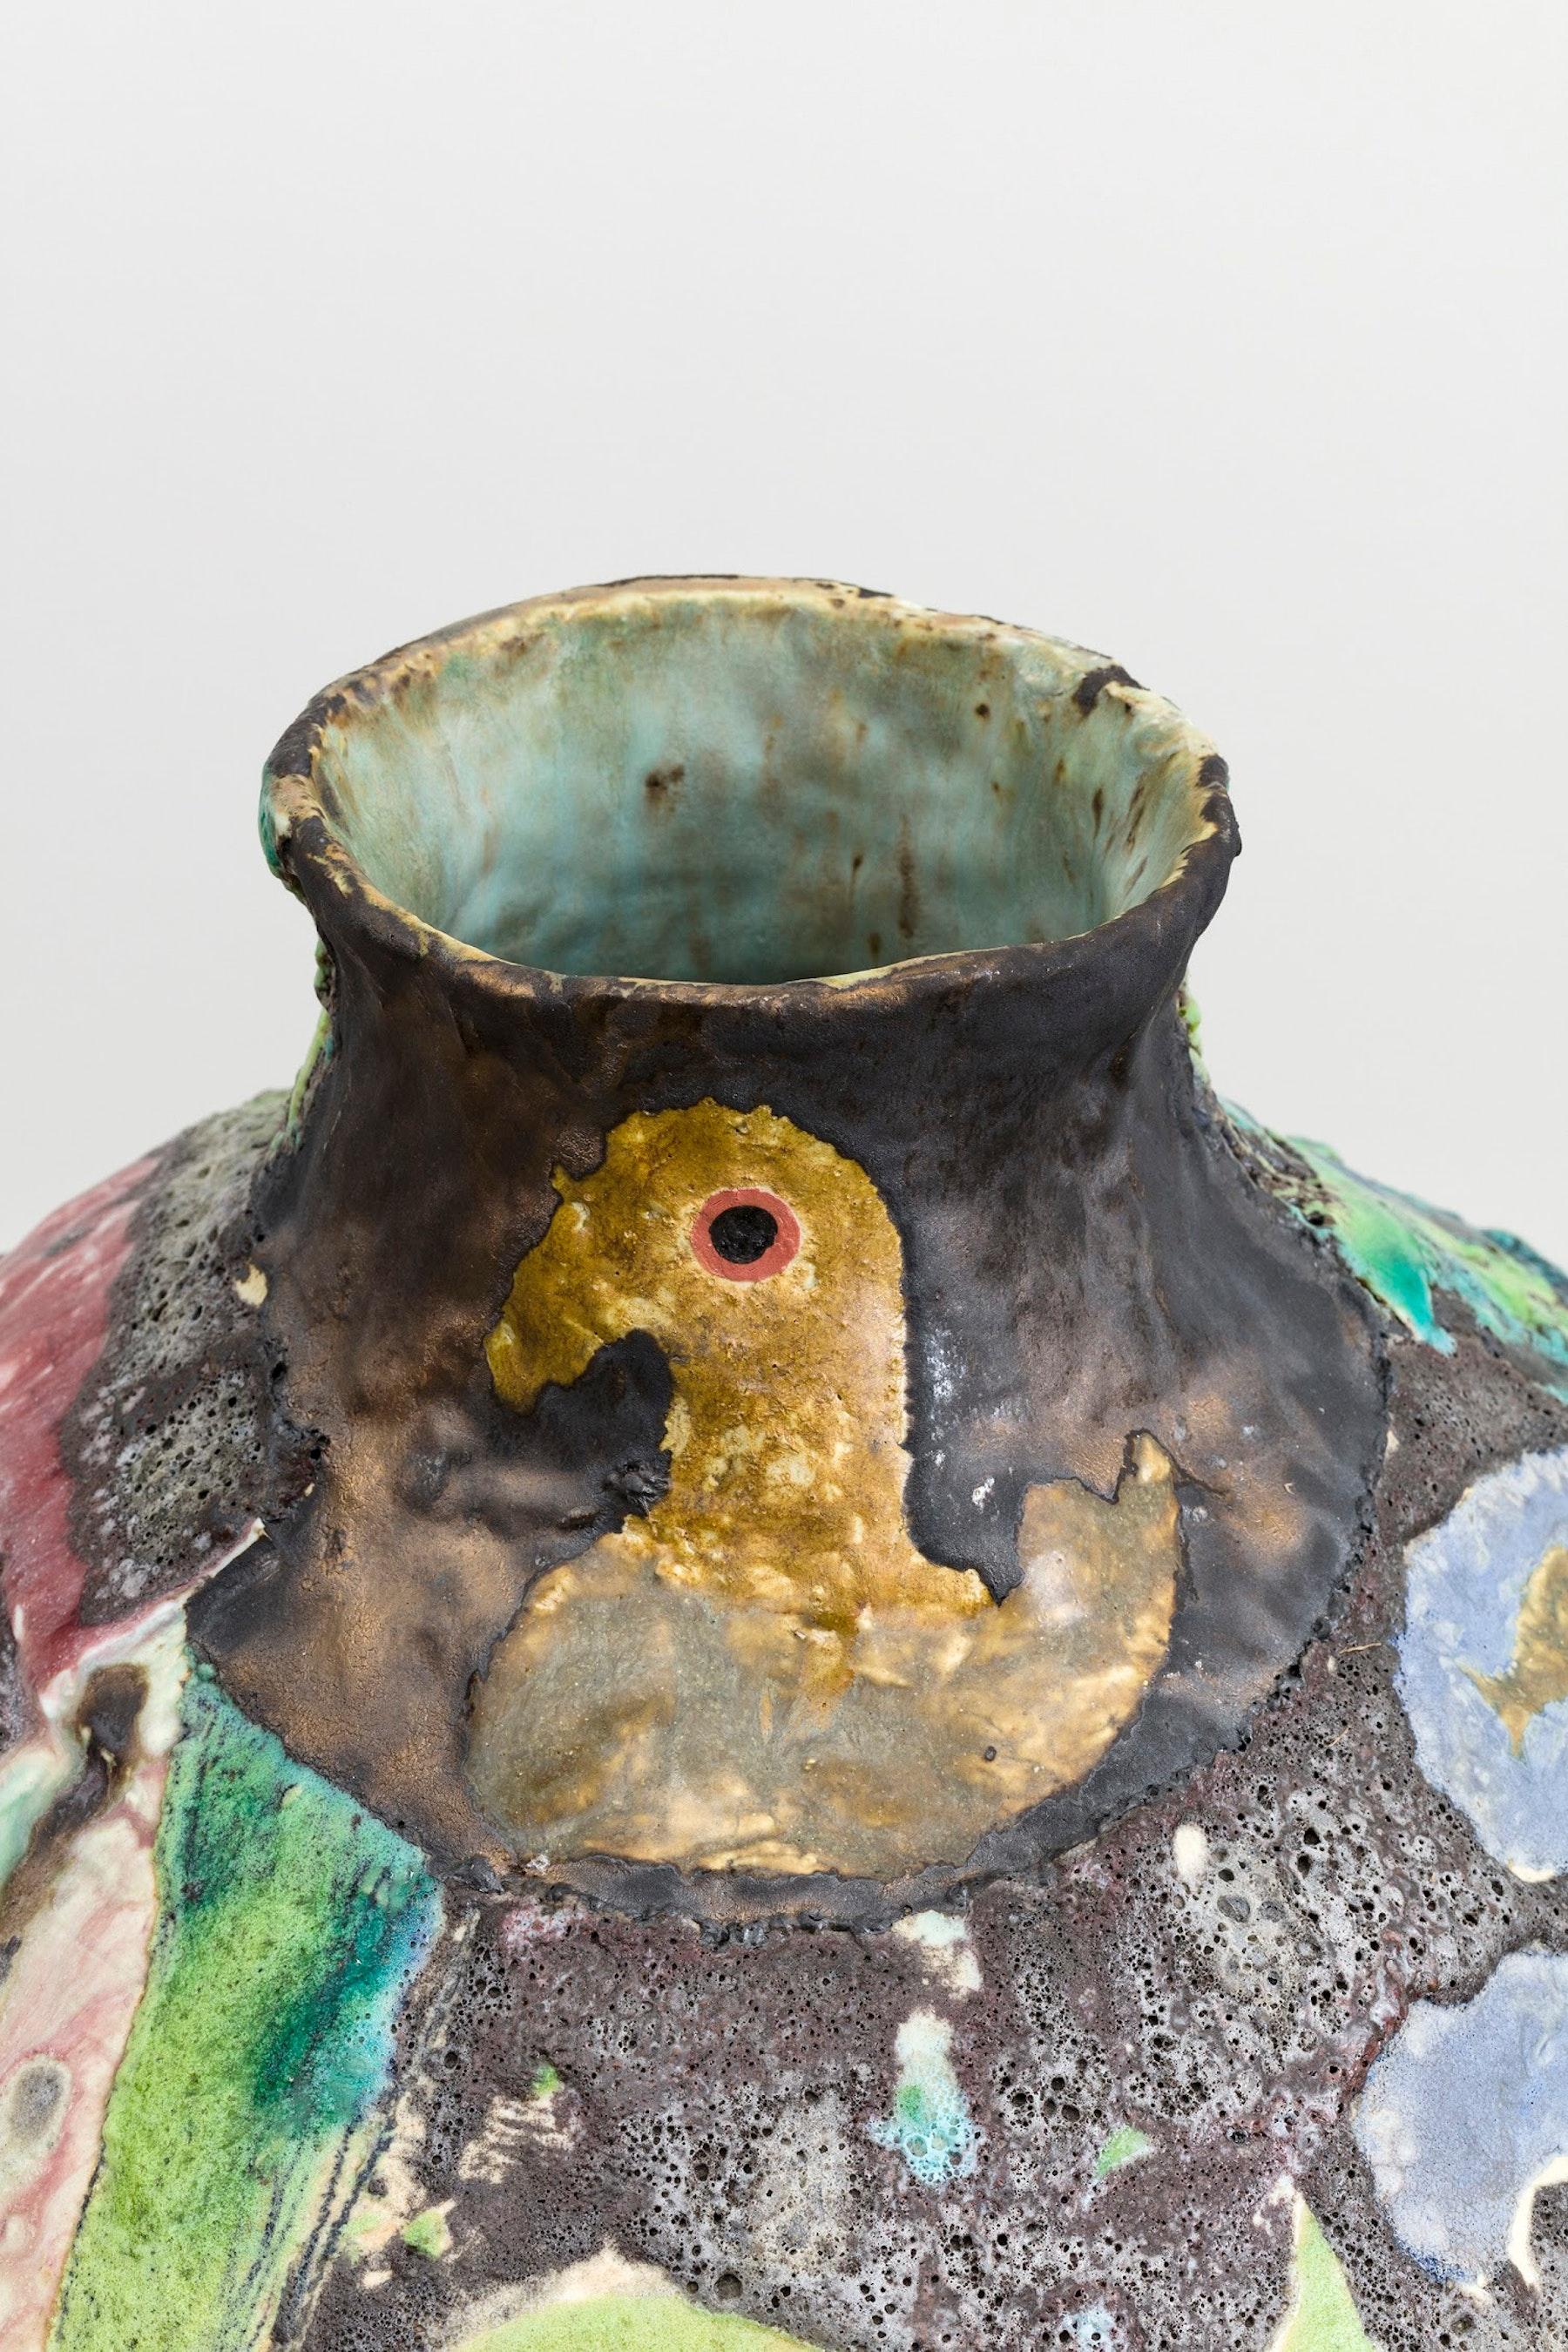 "Tam Van Tran ""Divinations Jar ll,"" 2019 High fire Ceramic 23 x 19 x 20"" [HxWxD] (58.42 x 48.26 x 50.8 cm) Inventory #TRA356 Courtesy of the artist and Vielmetter Los Angeles Photo credit: Jeff McLane"